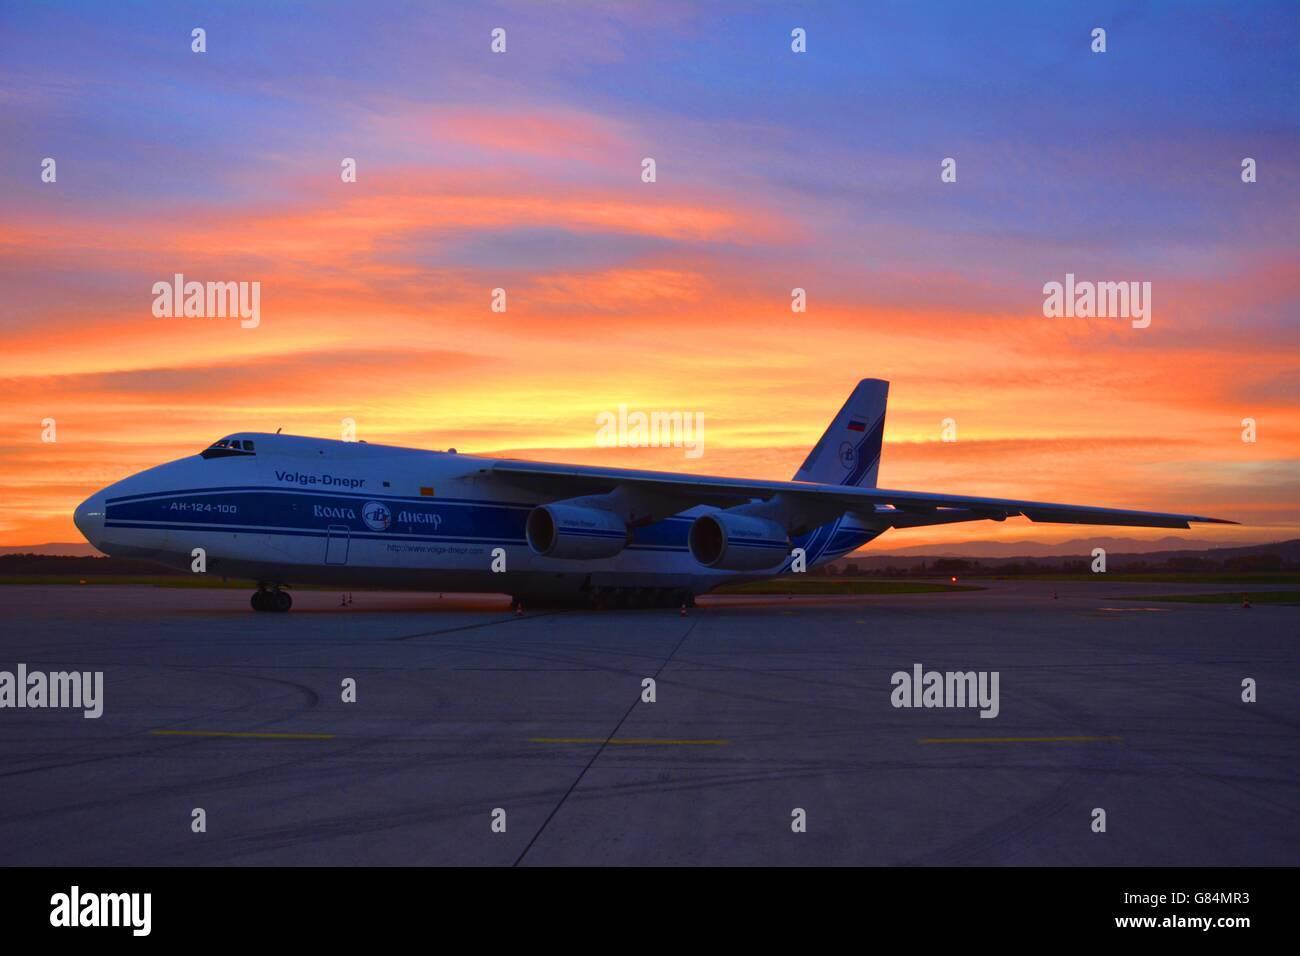 Burning sky backing an Antonov An124 - Stock Image